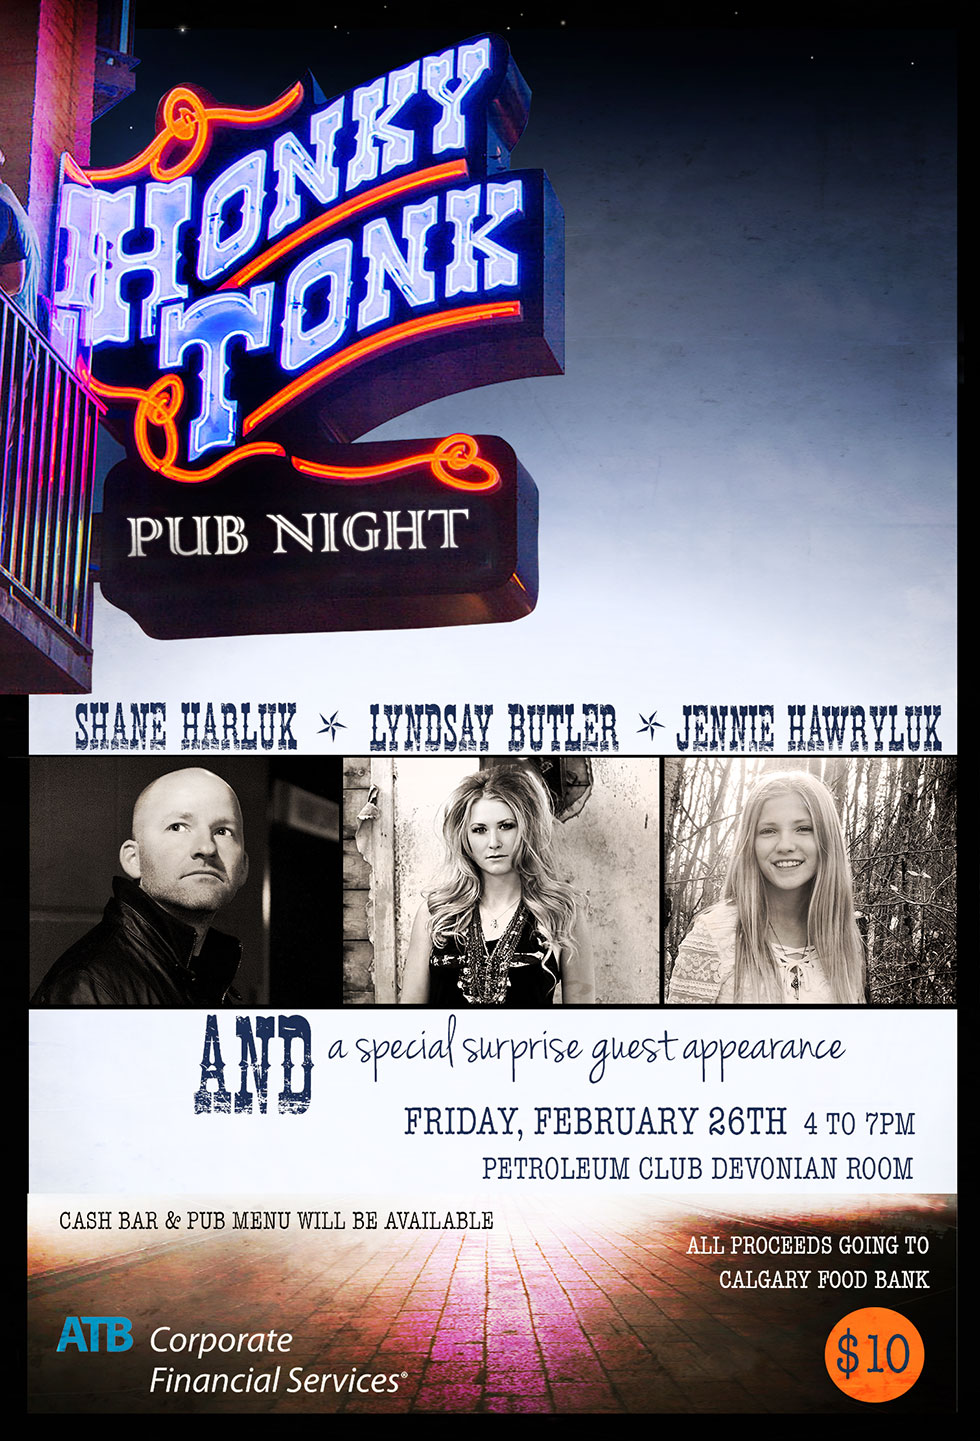 Honky Tonk Pub Night